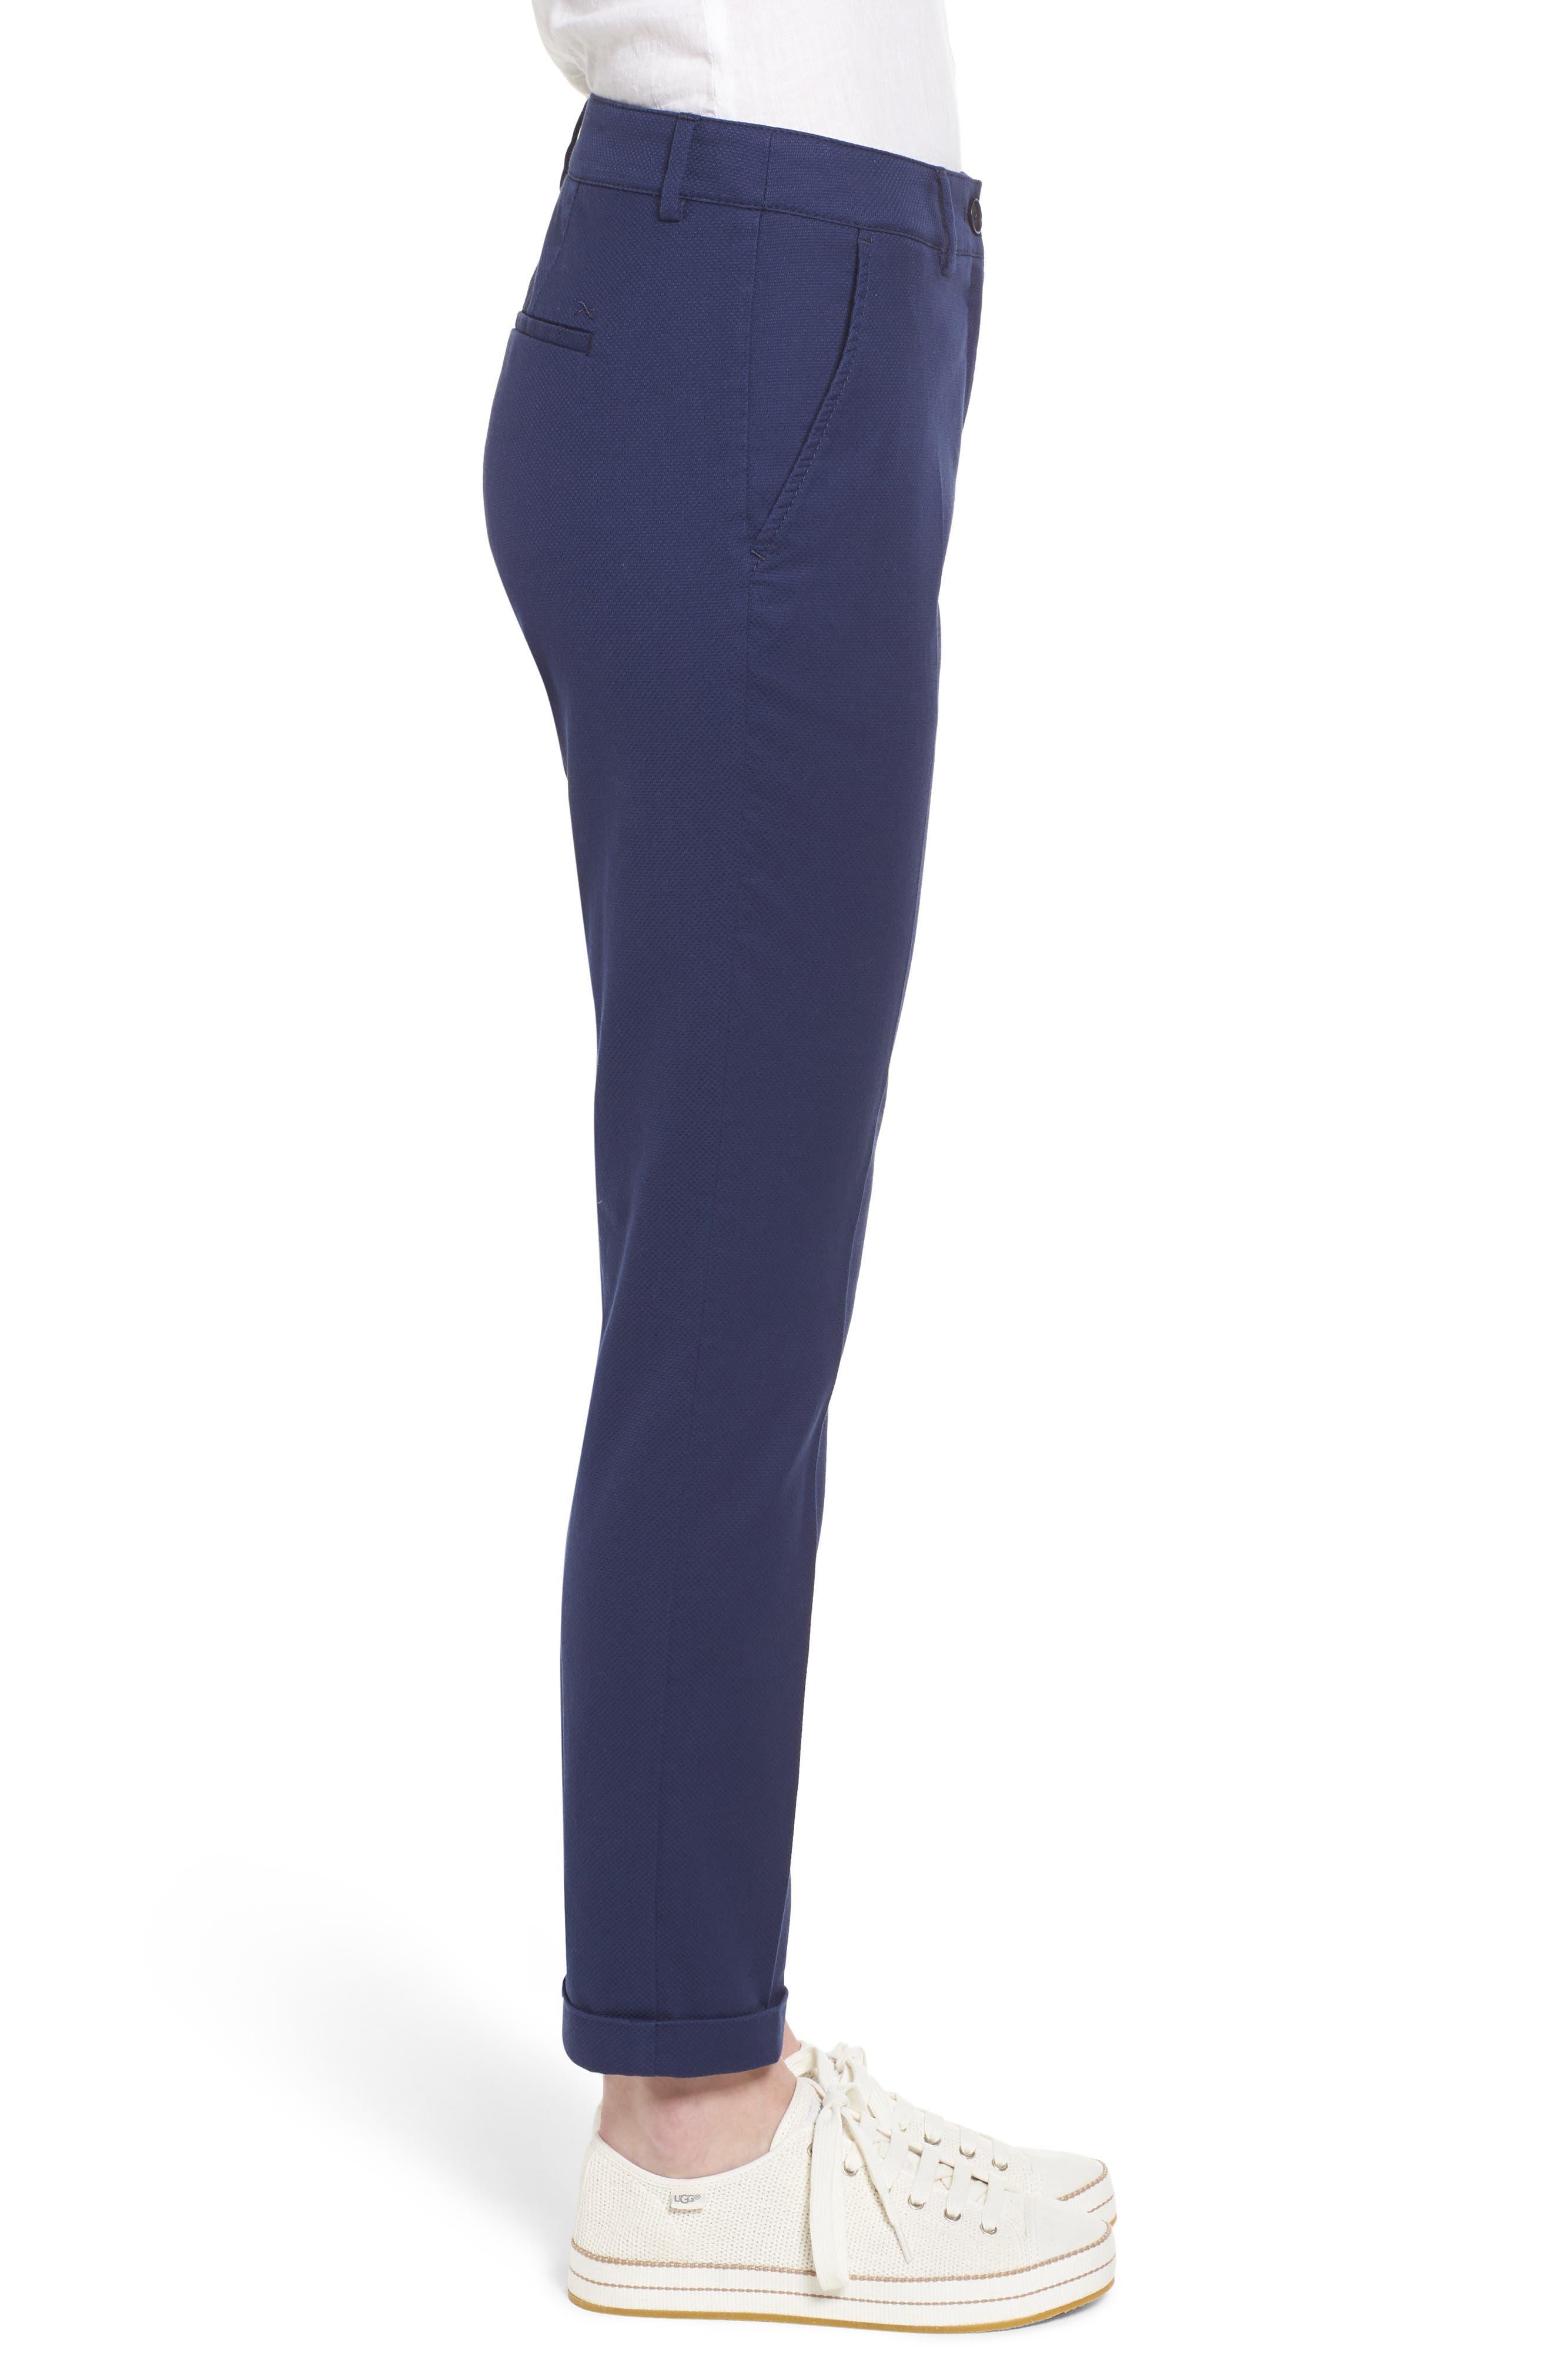 Maron Cuffed Straight Leg Pants,                             Alternate thumbnail 3, color,